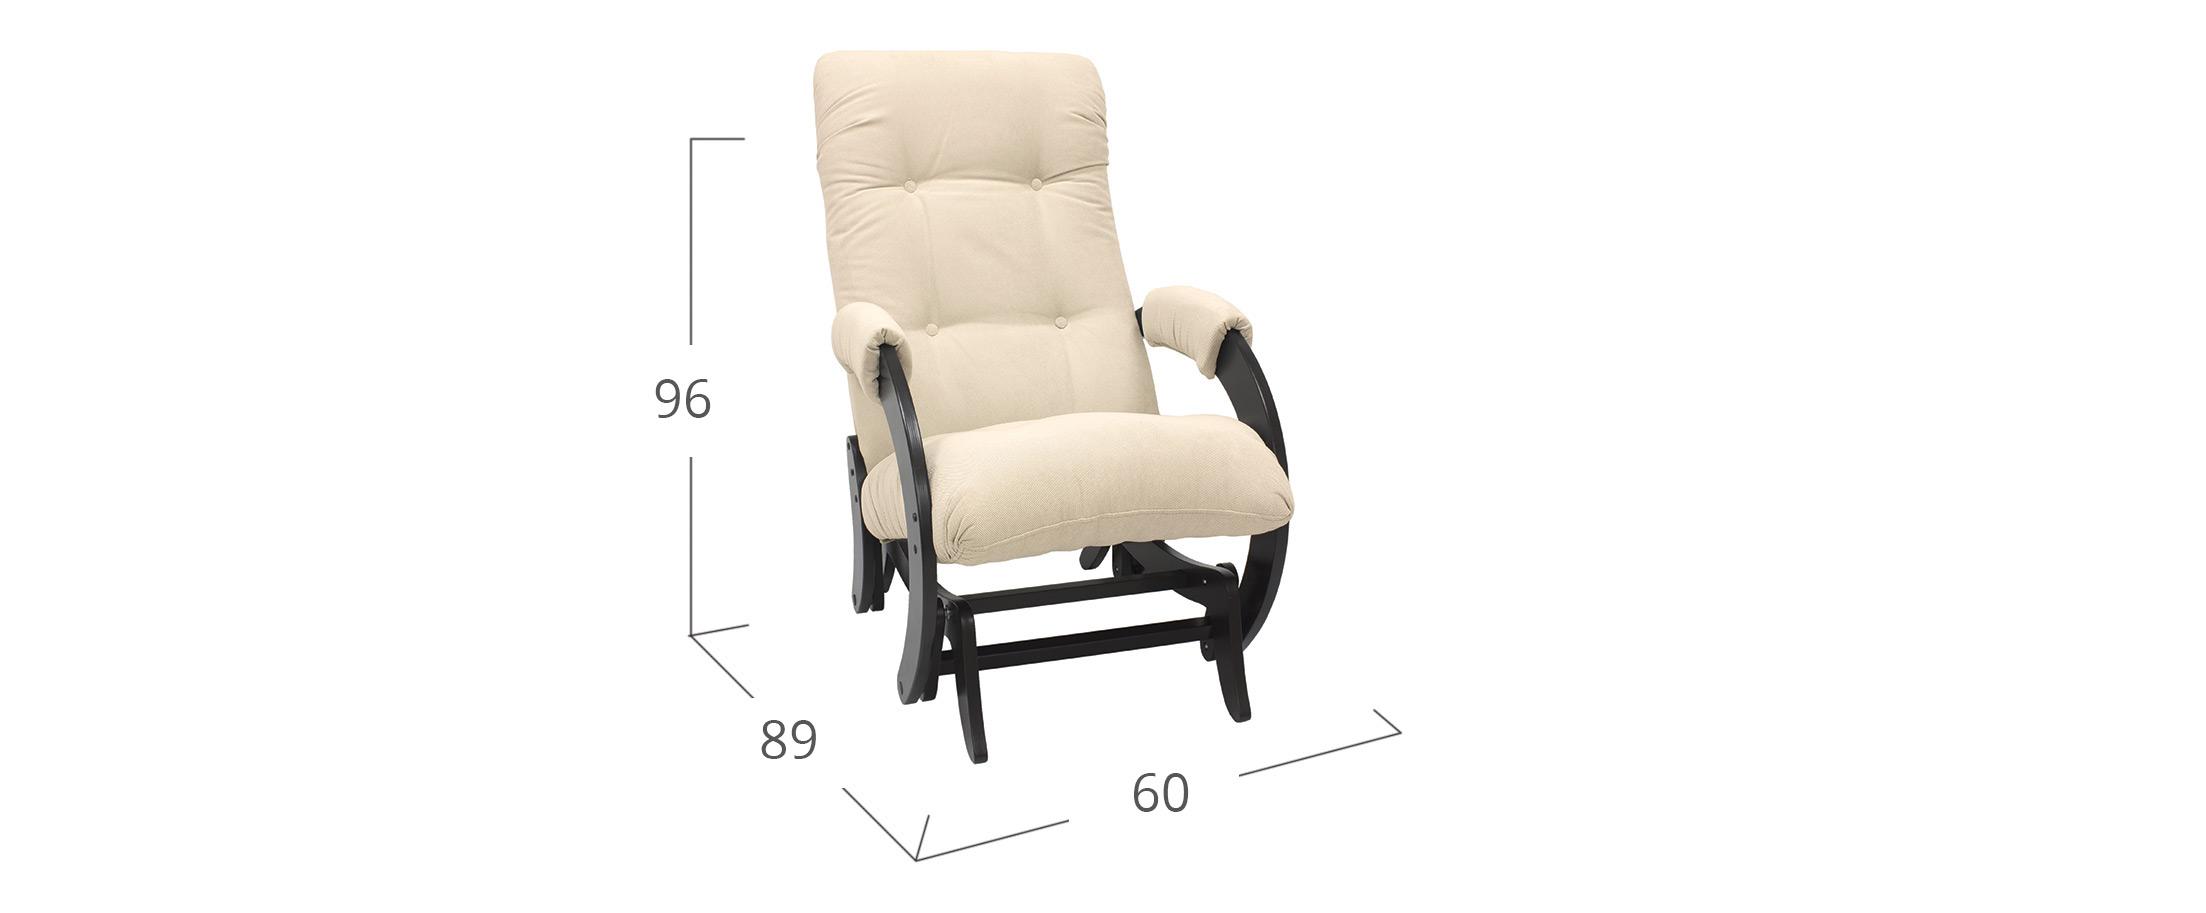 Кресло-гляйдер 68 Verona Vanilla Венге